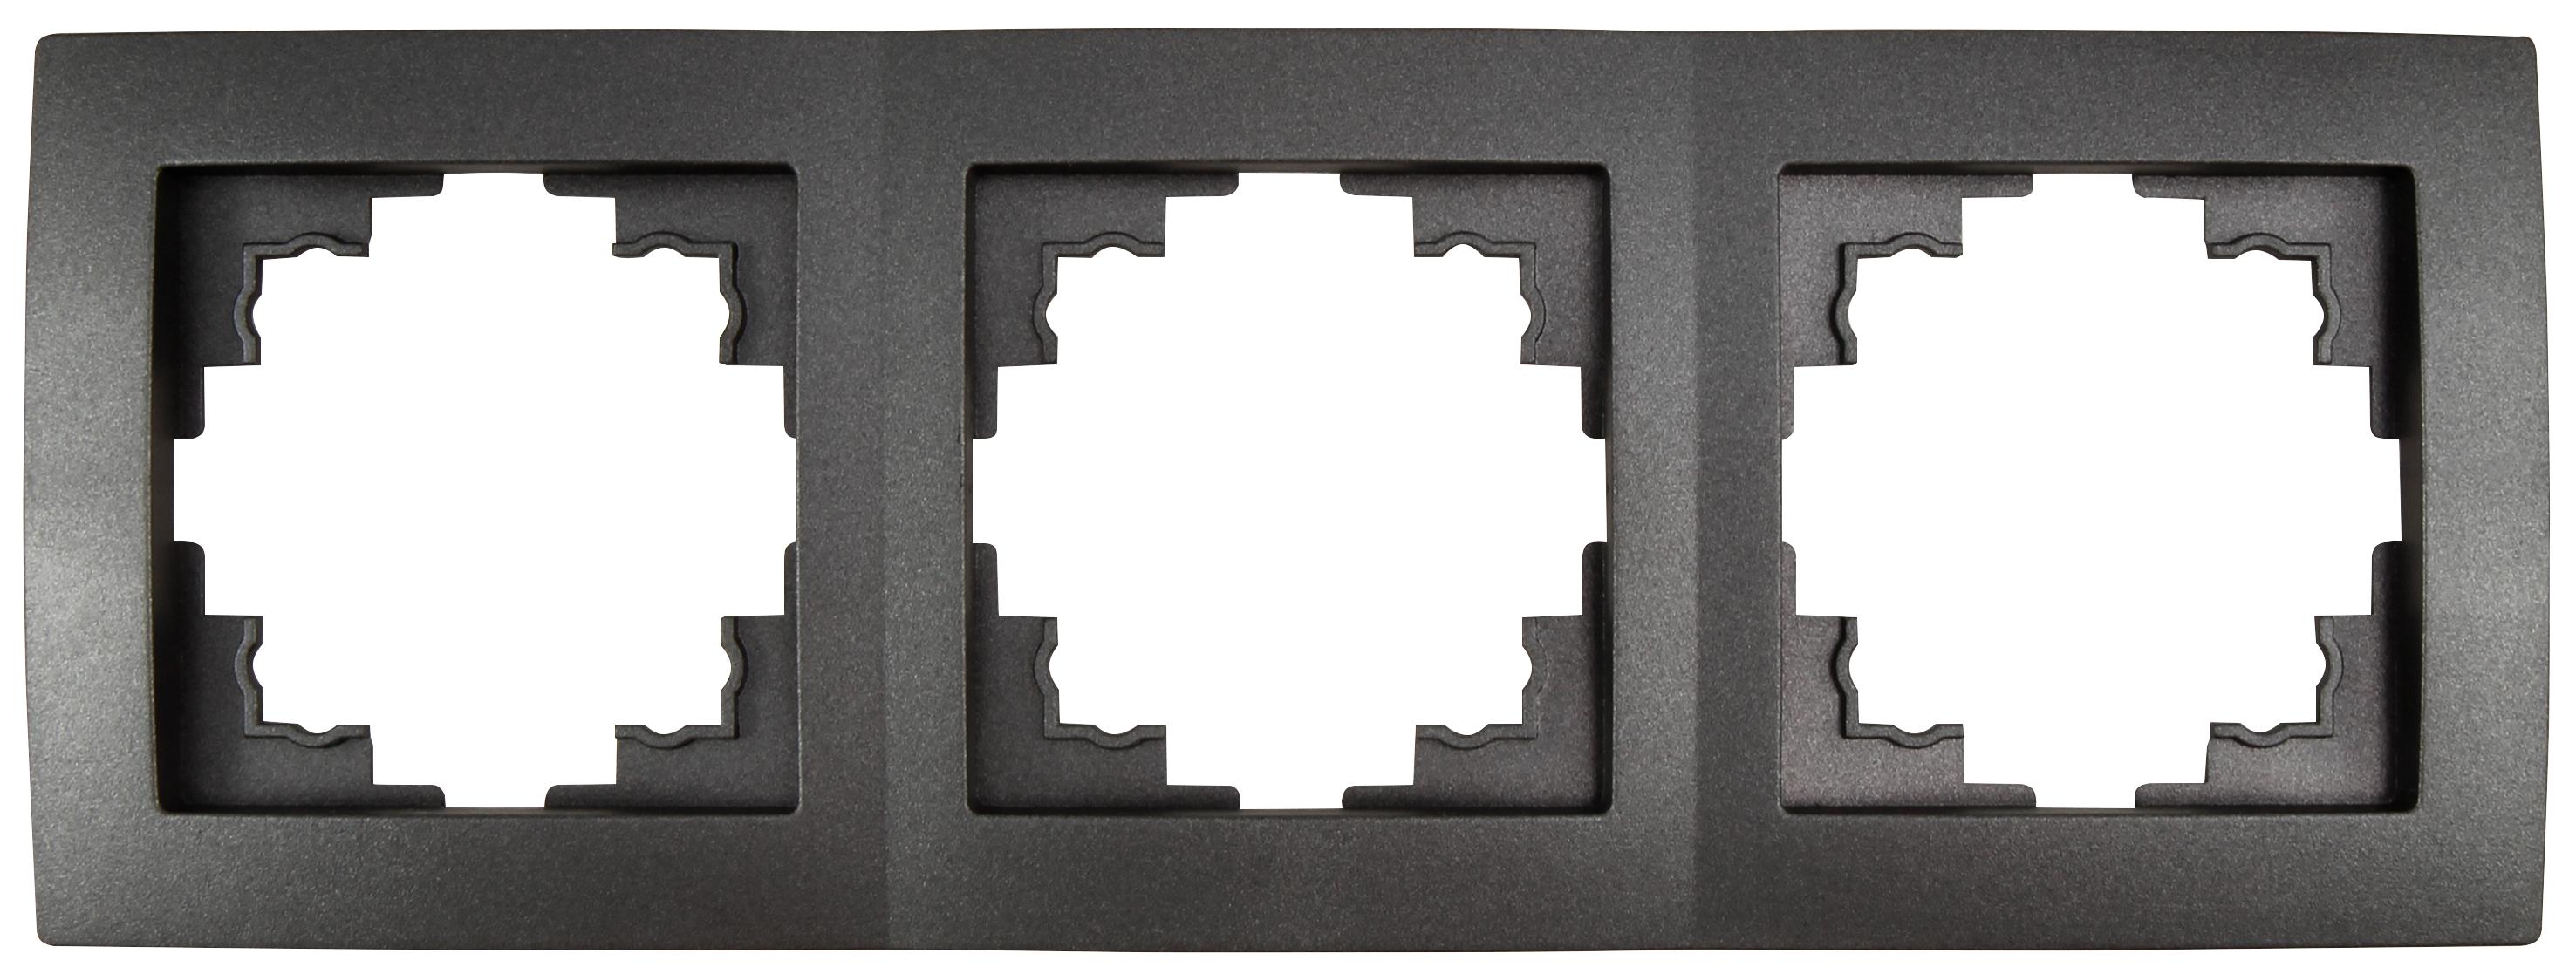 Rahmen McPower ''Flair'', 3-fach, anthrazit, 18er-Pack